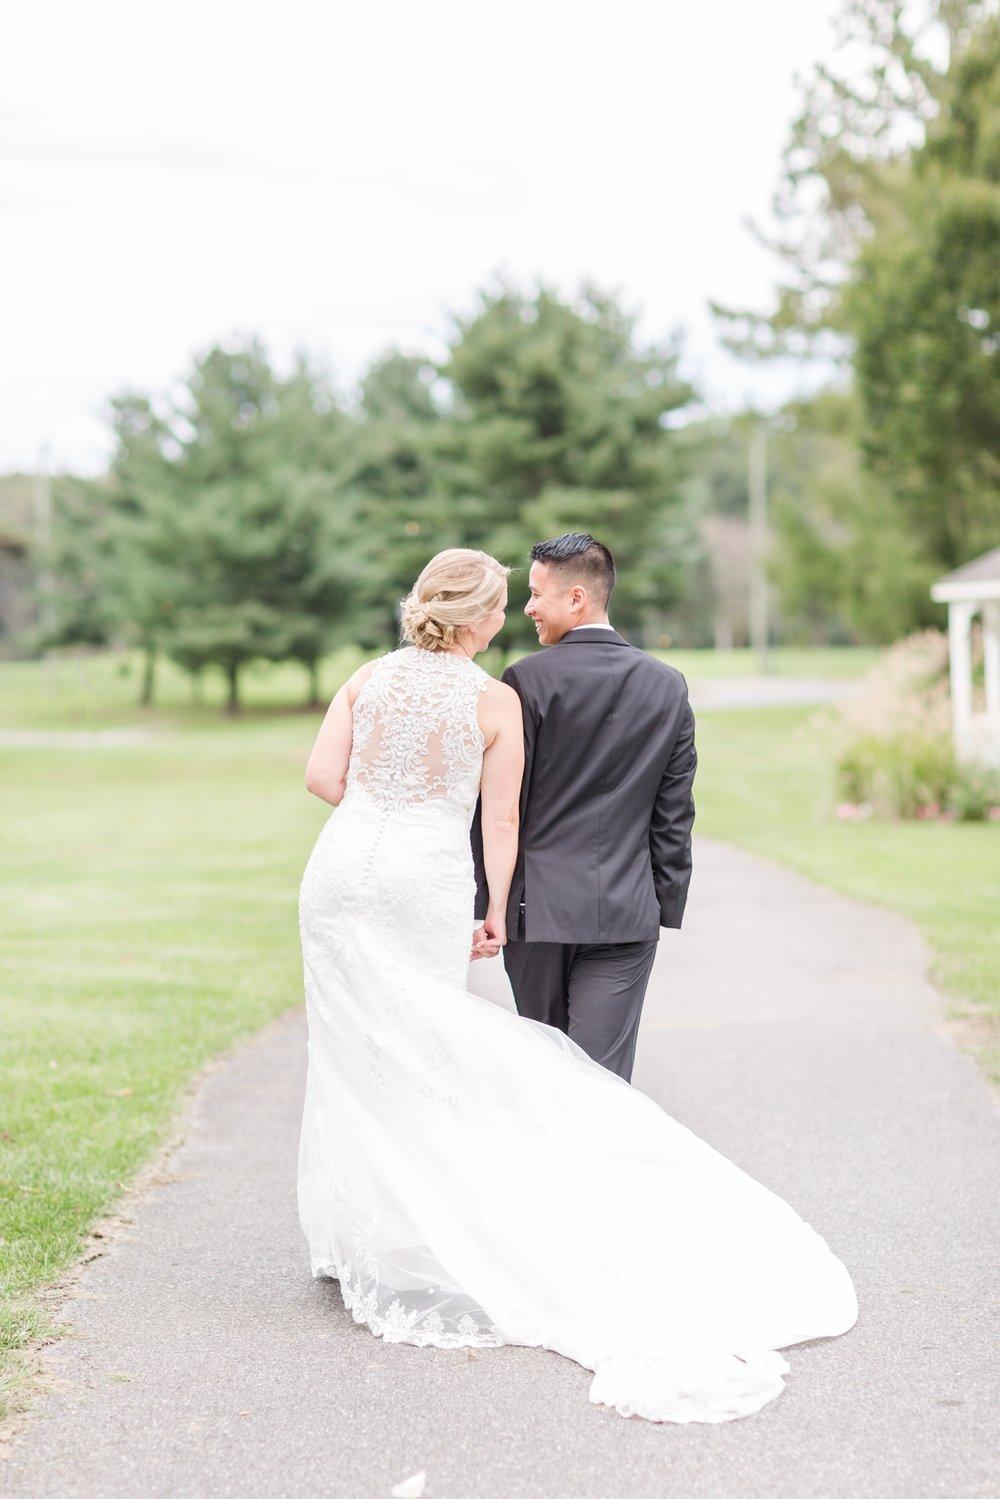 WONG WEDDING HIGHLIGHTS-233_Deerfield-Country-Club-Wedding-Delaware-Maryland-wedding-photographer-anna-grace-photography-photo.jpg